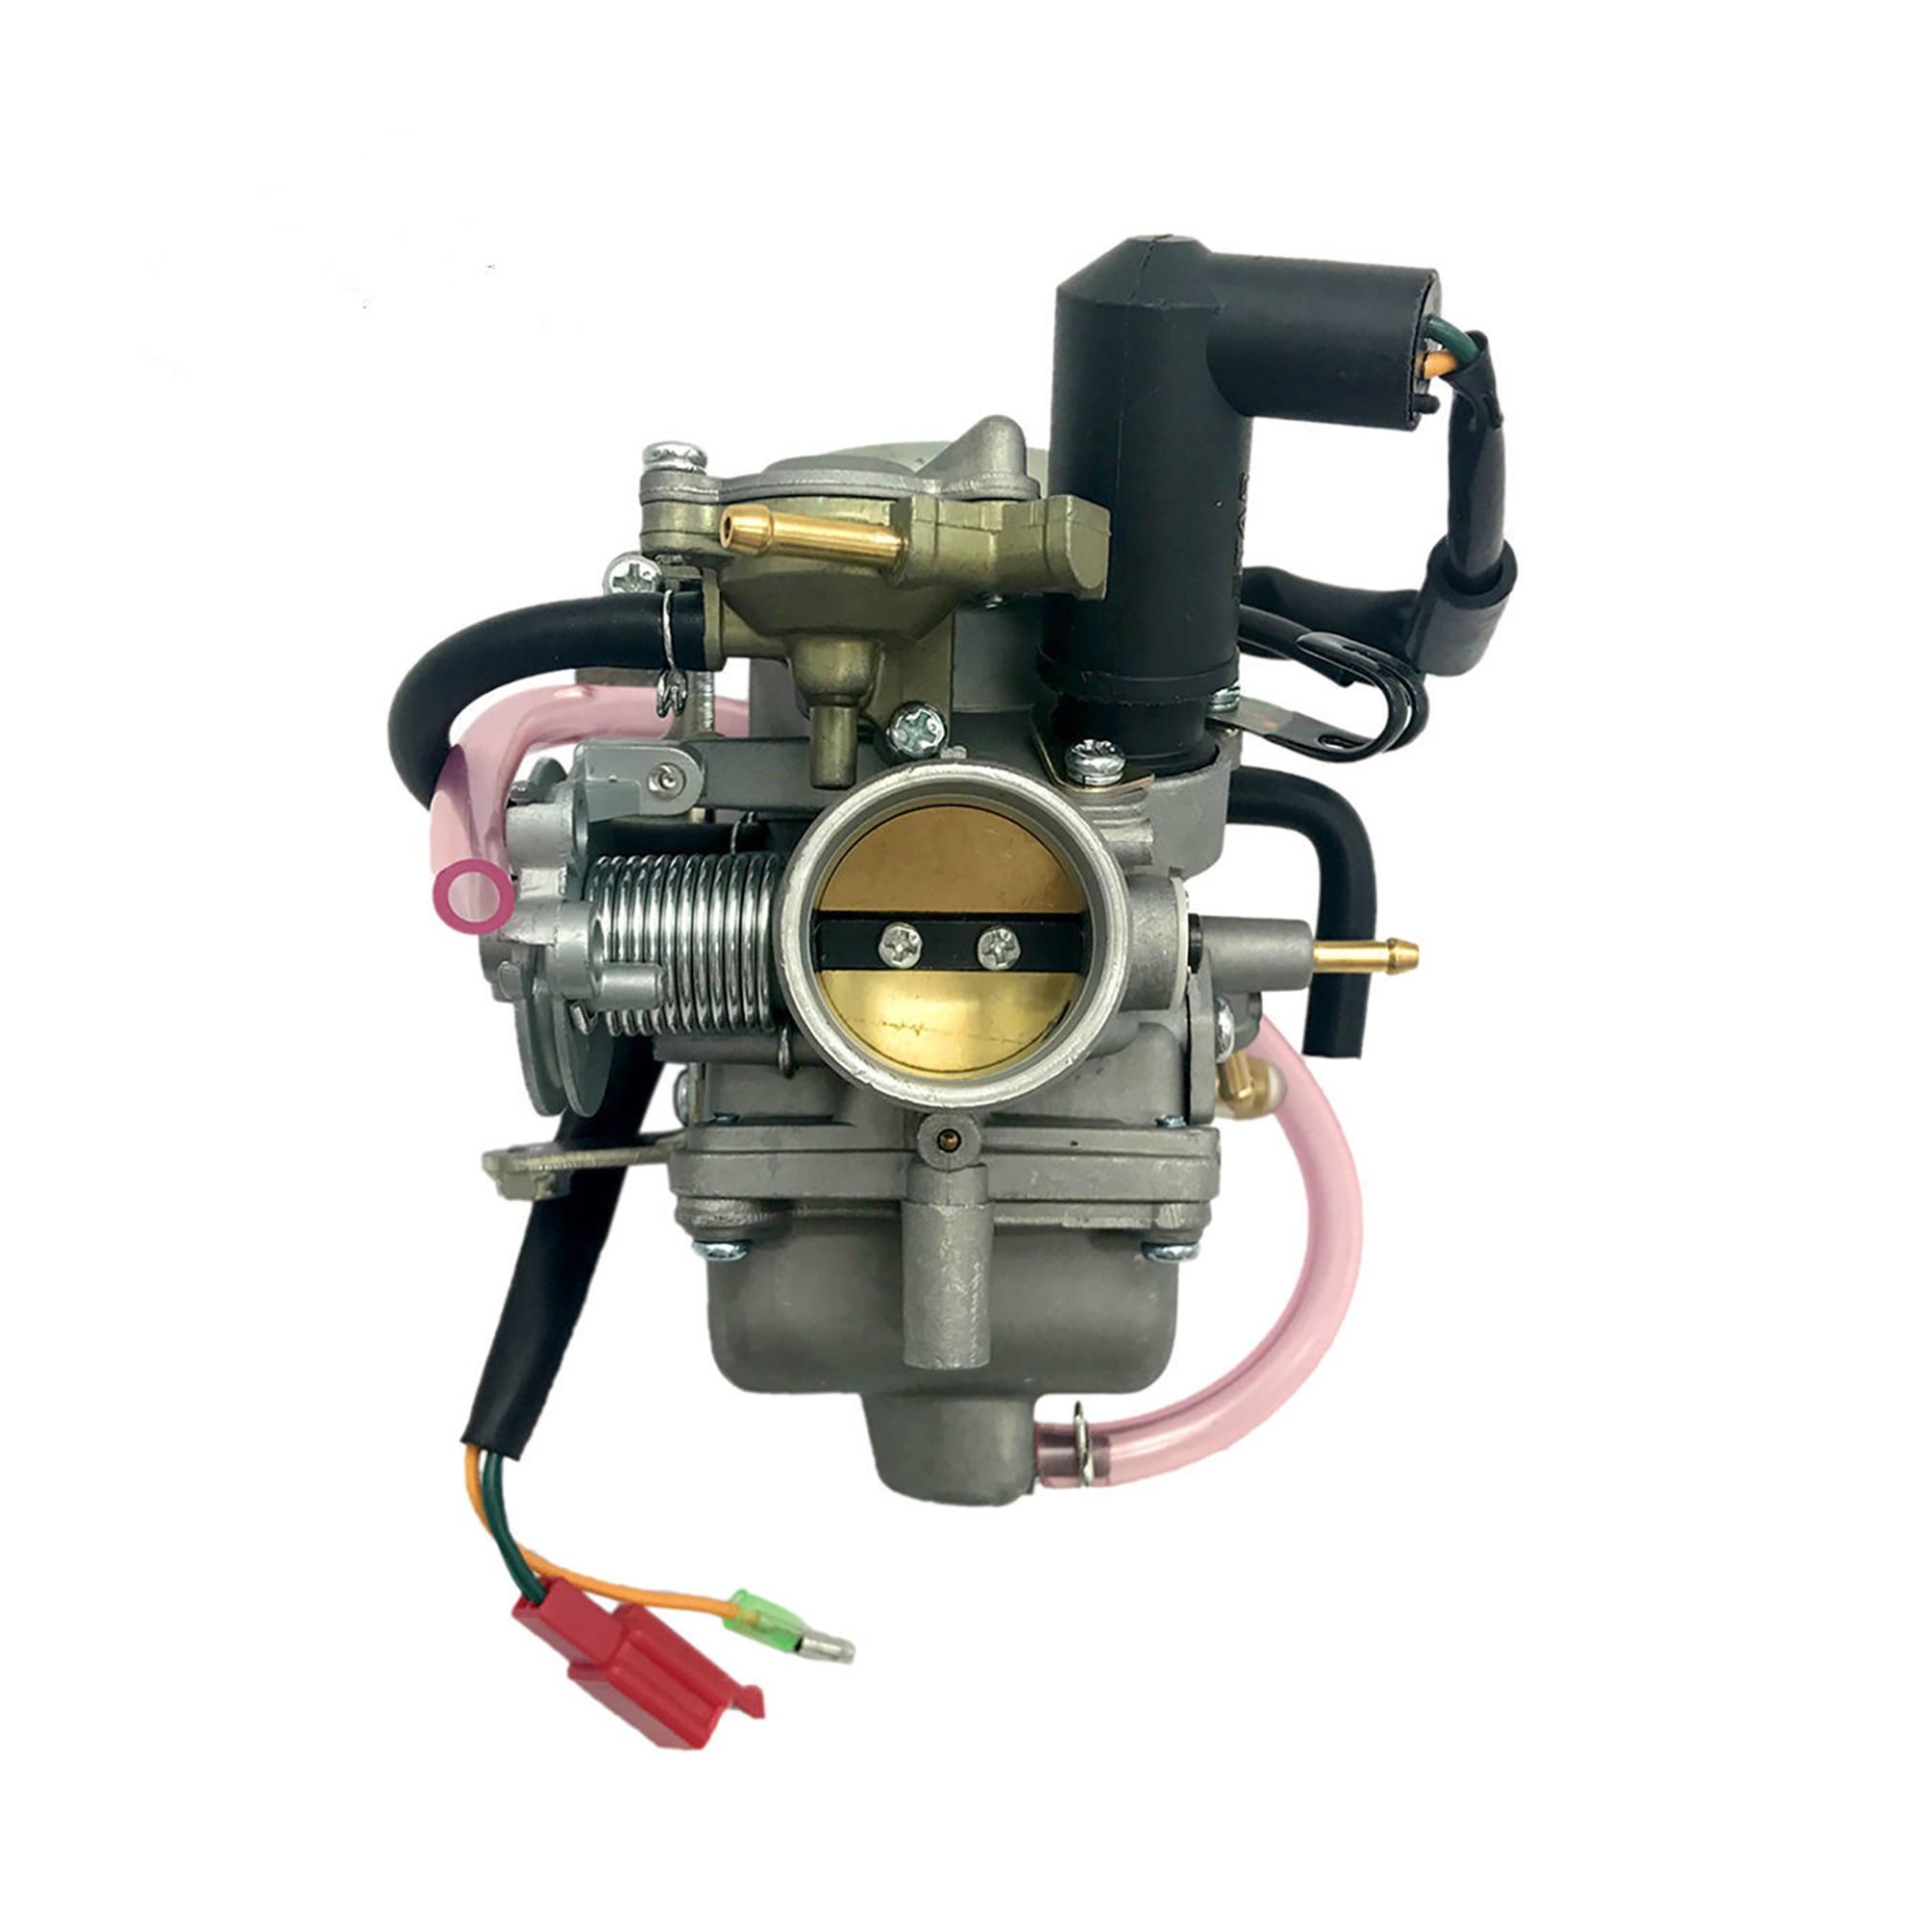 30MM W/eléctrico pd30j carburador para Honda Helix CN 250 CN250 GY6 150cc Carter Dazon JCL Kinroad 250cc 300cc CF250cc ATV Go Kart